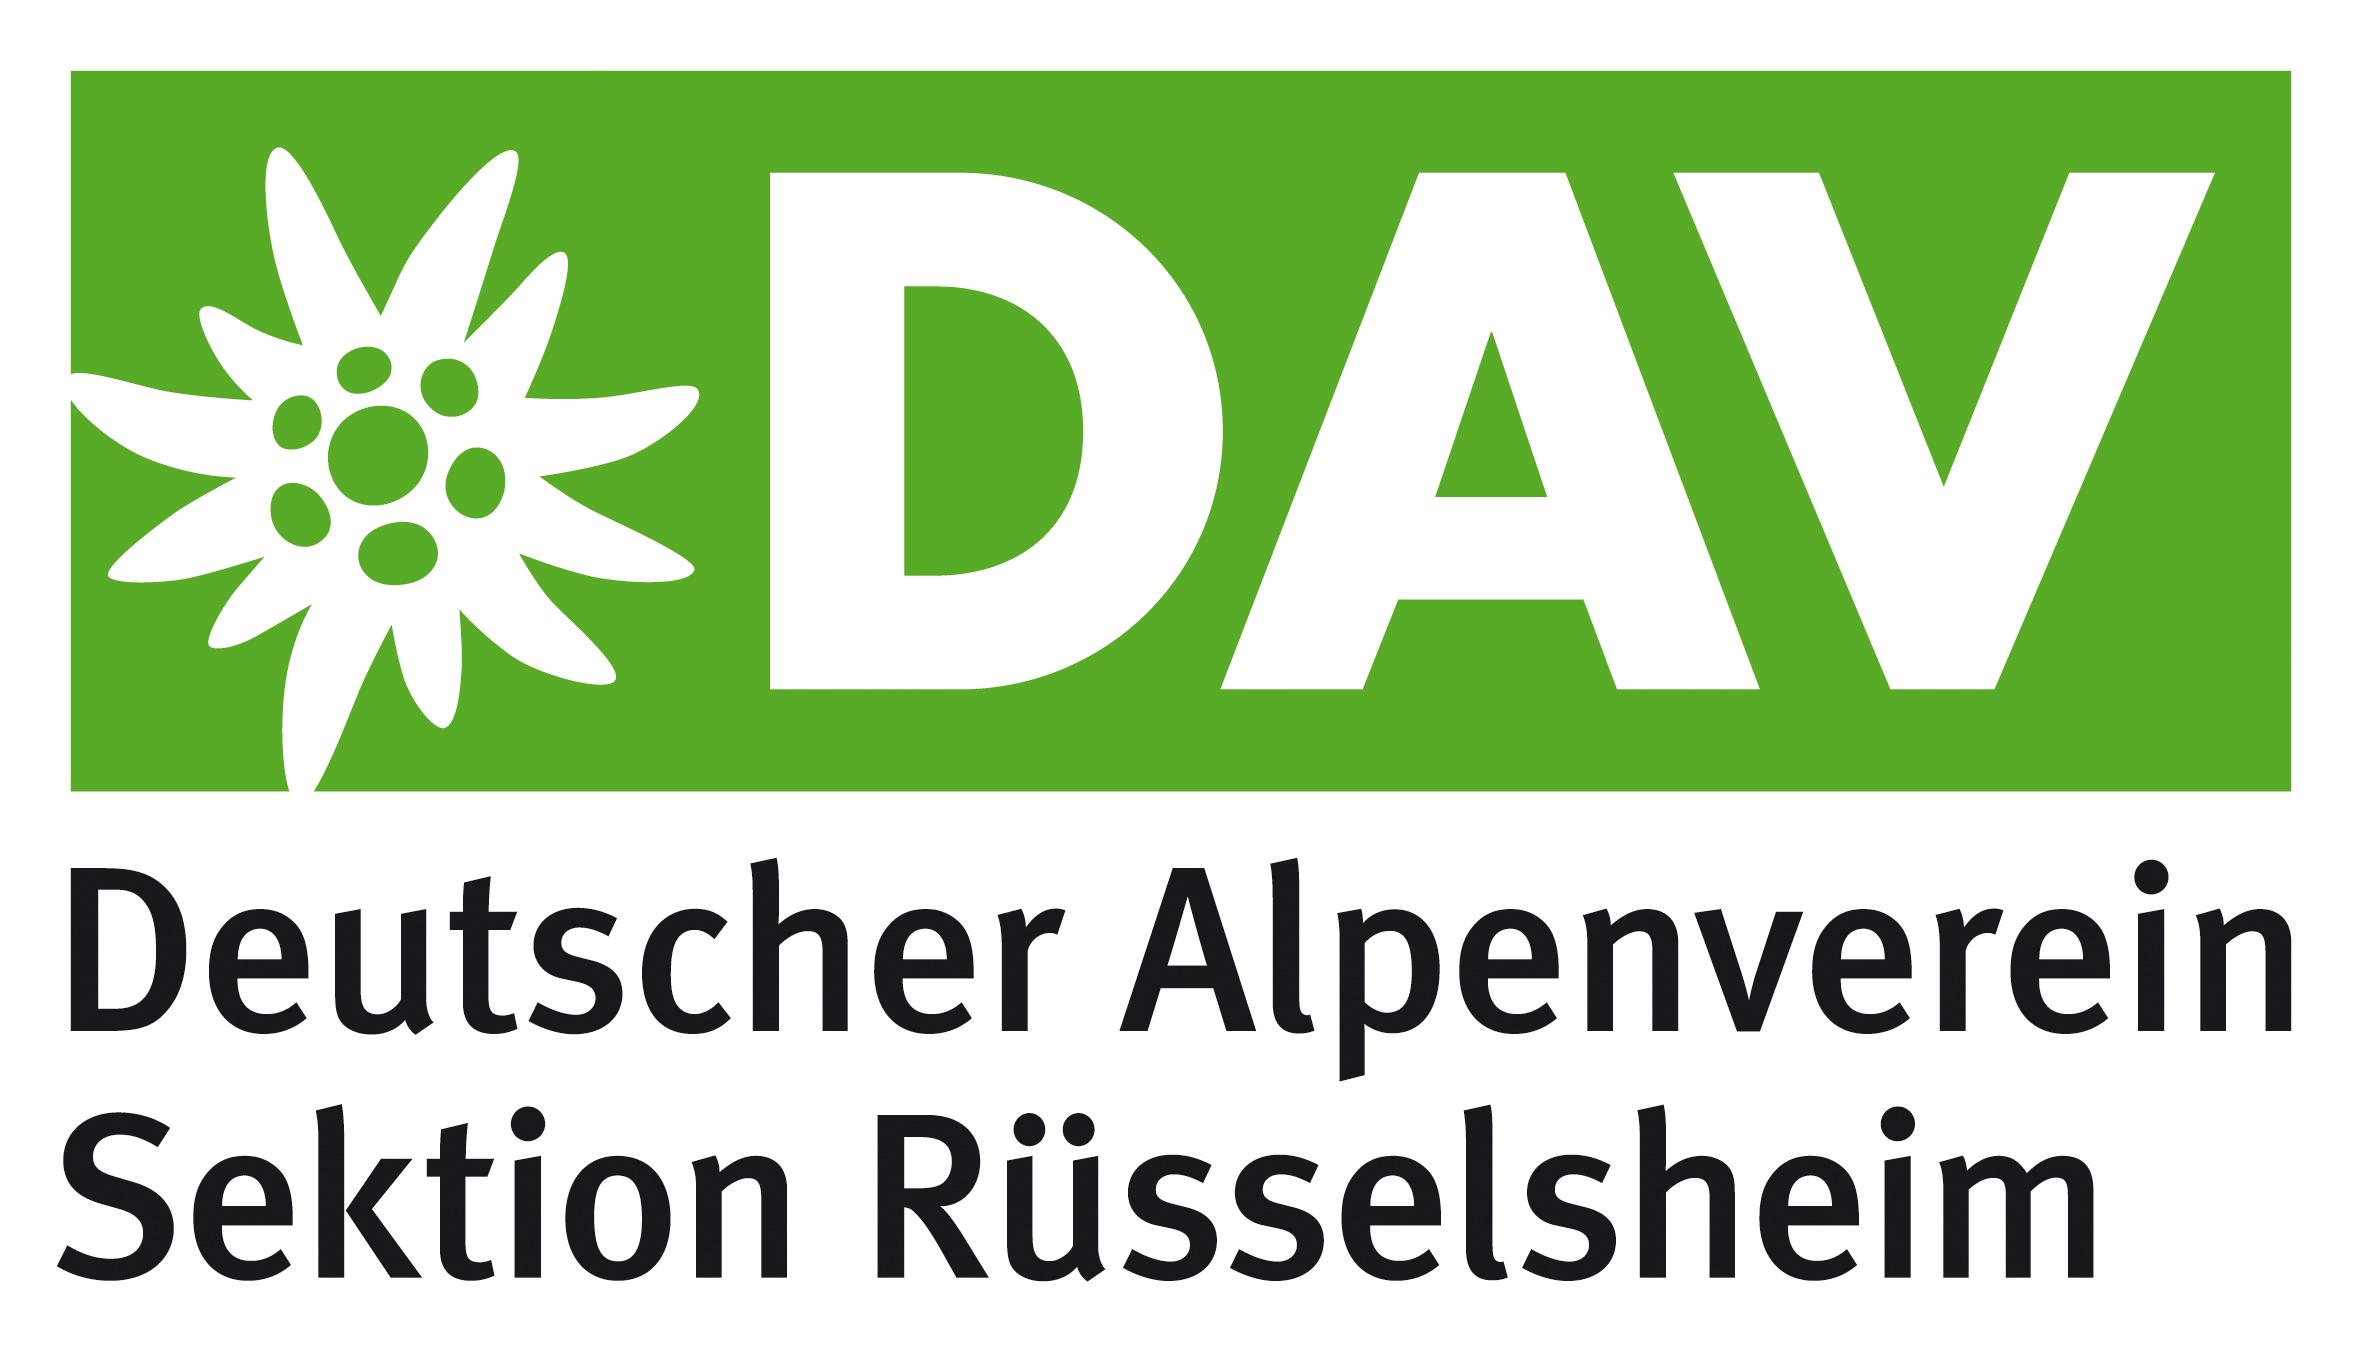 DAV Sektion Rüsselsheim